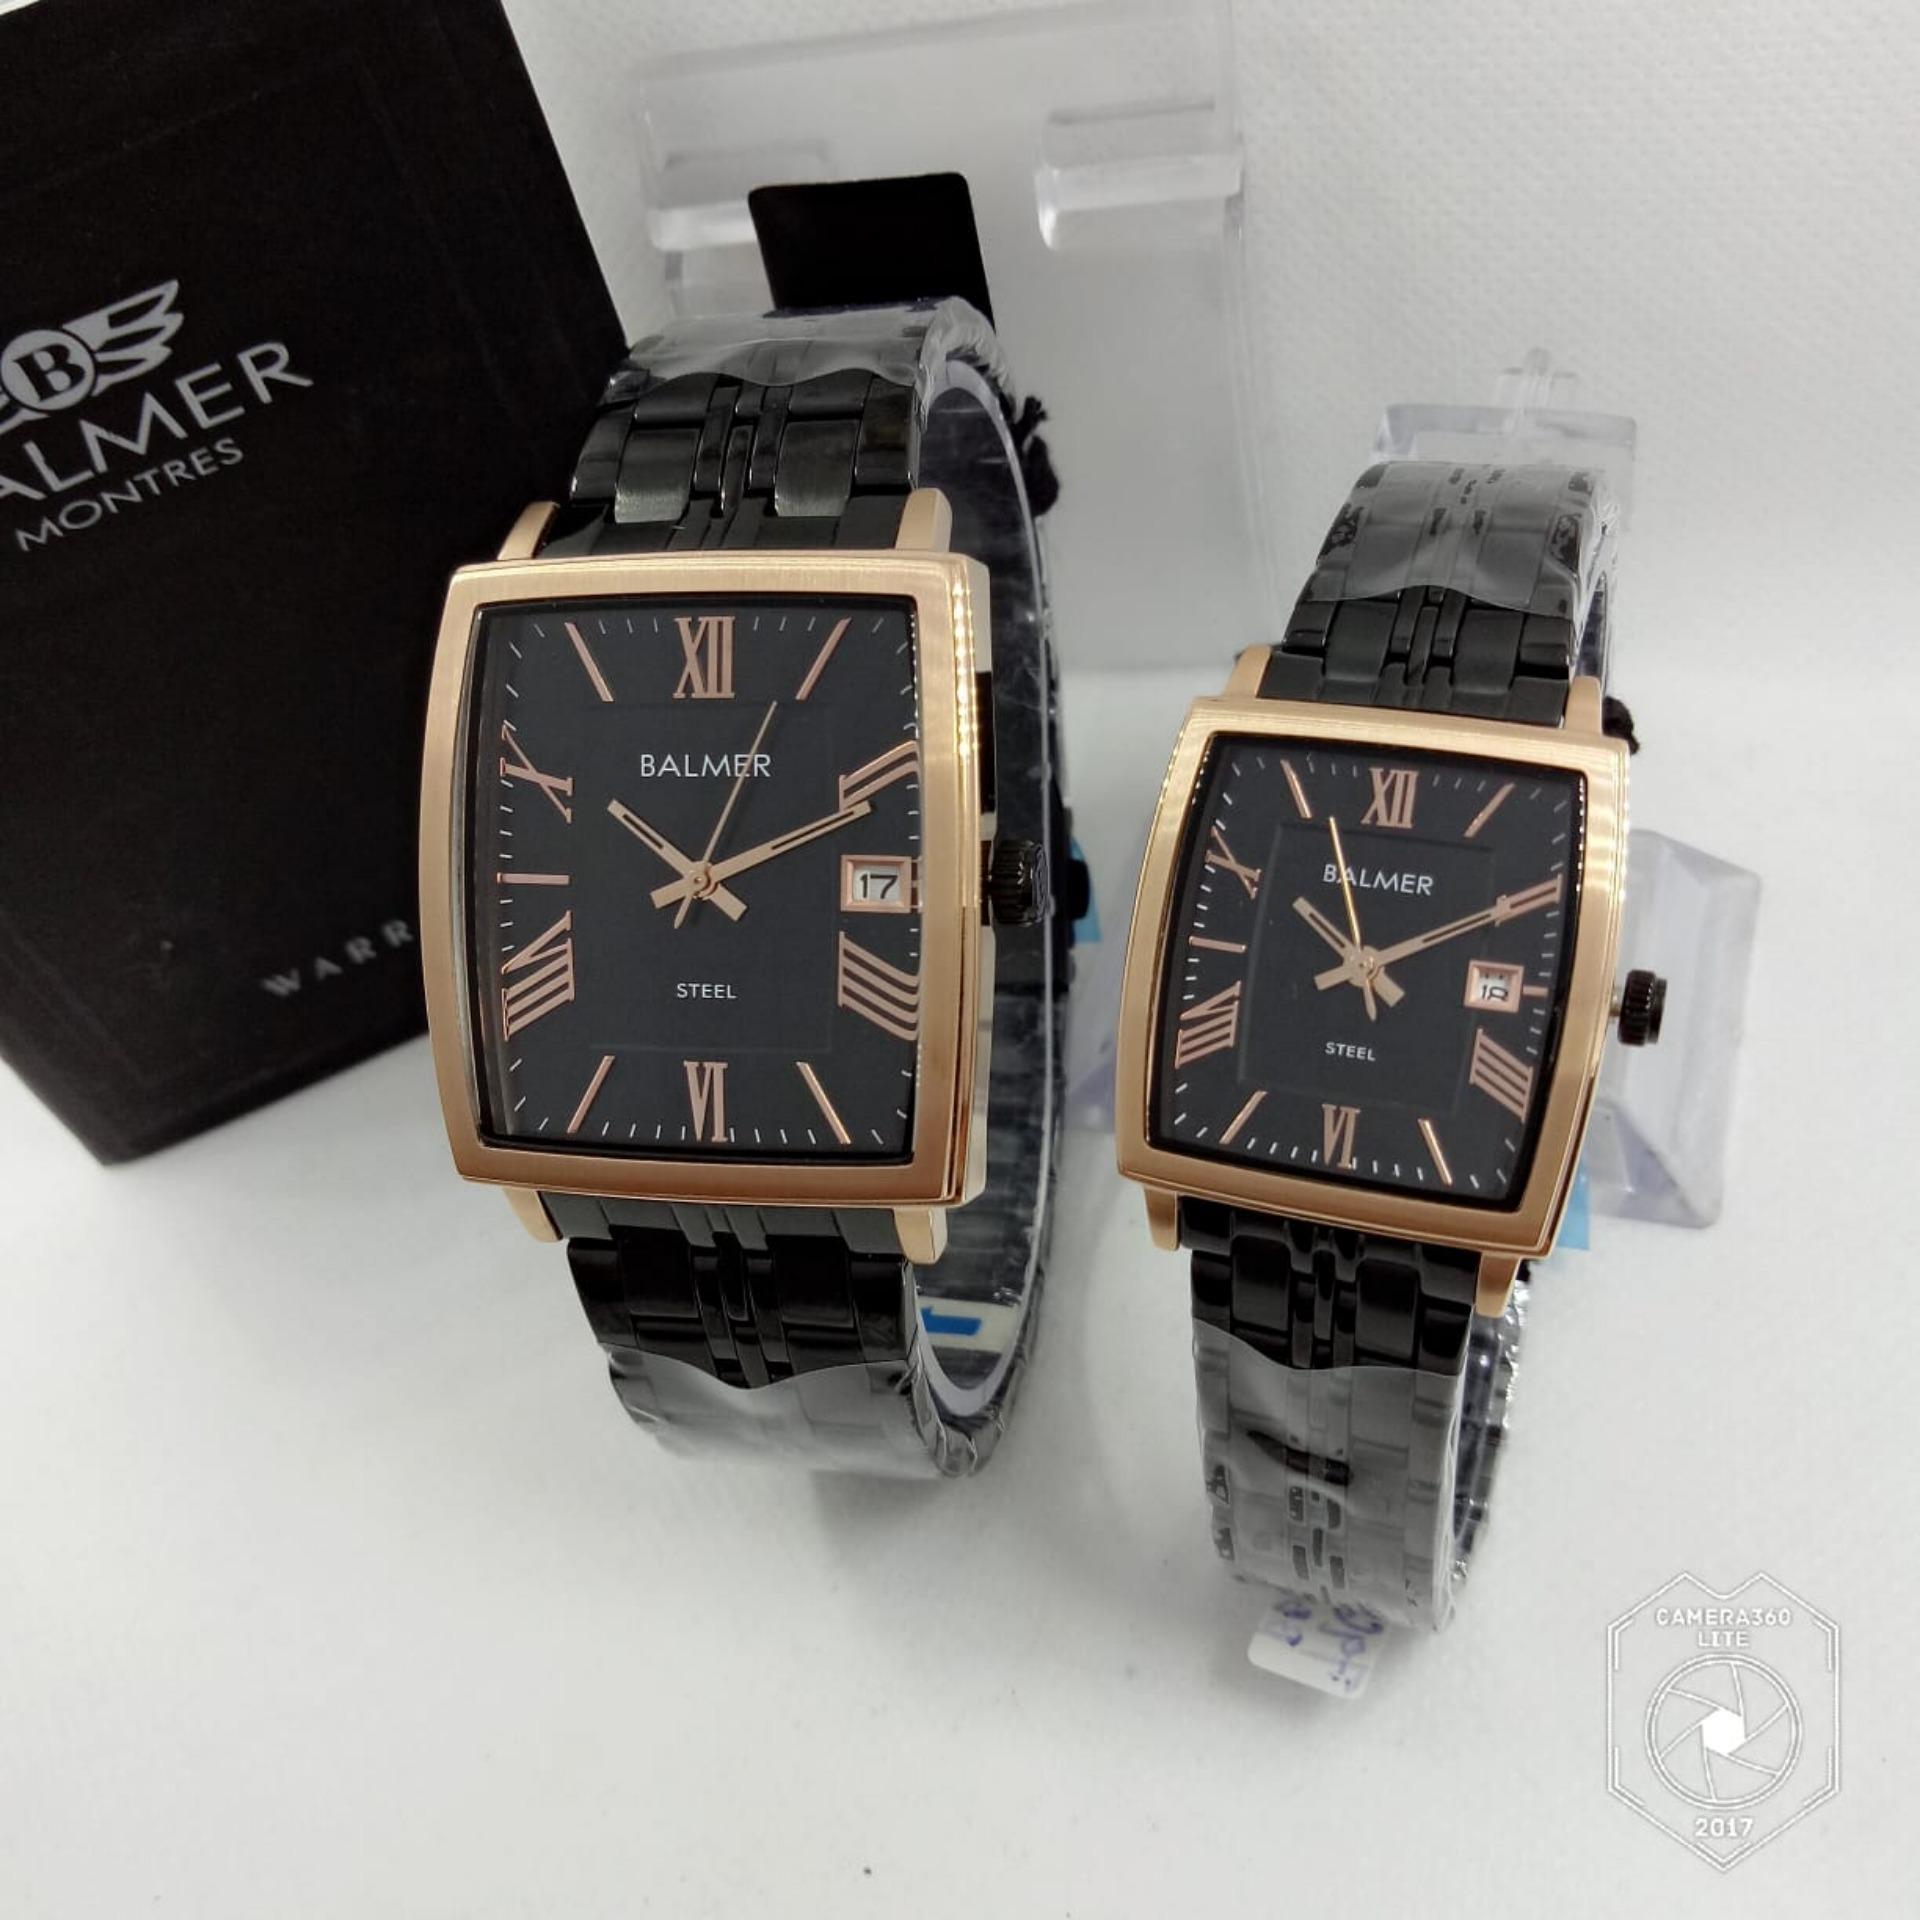 Balmer Bl 7913 Dbg Jam Tangan Couple Serries Dark Brown Gold Leather Alba Atcs30 Wanita Silver Strap Daftar Harga